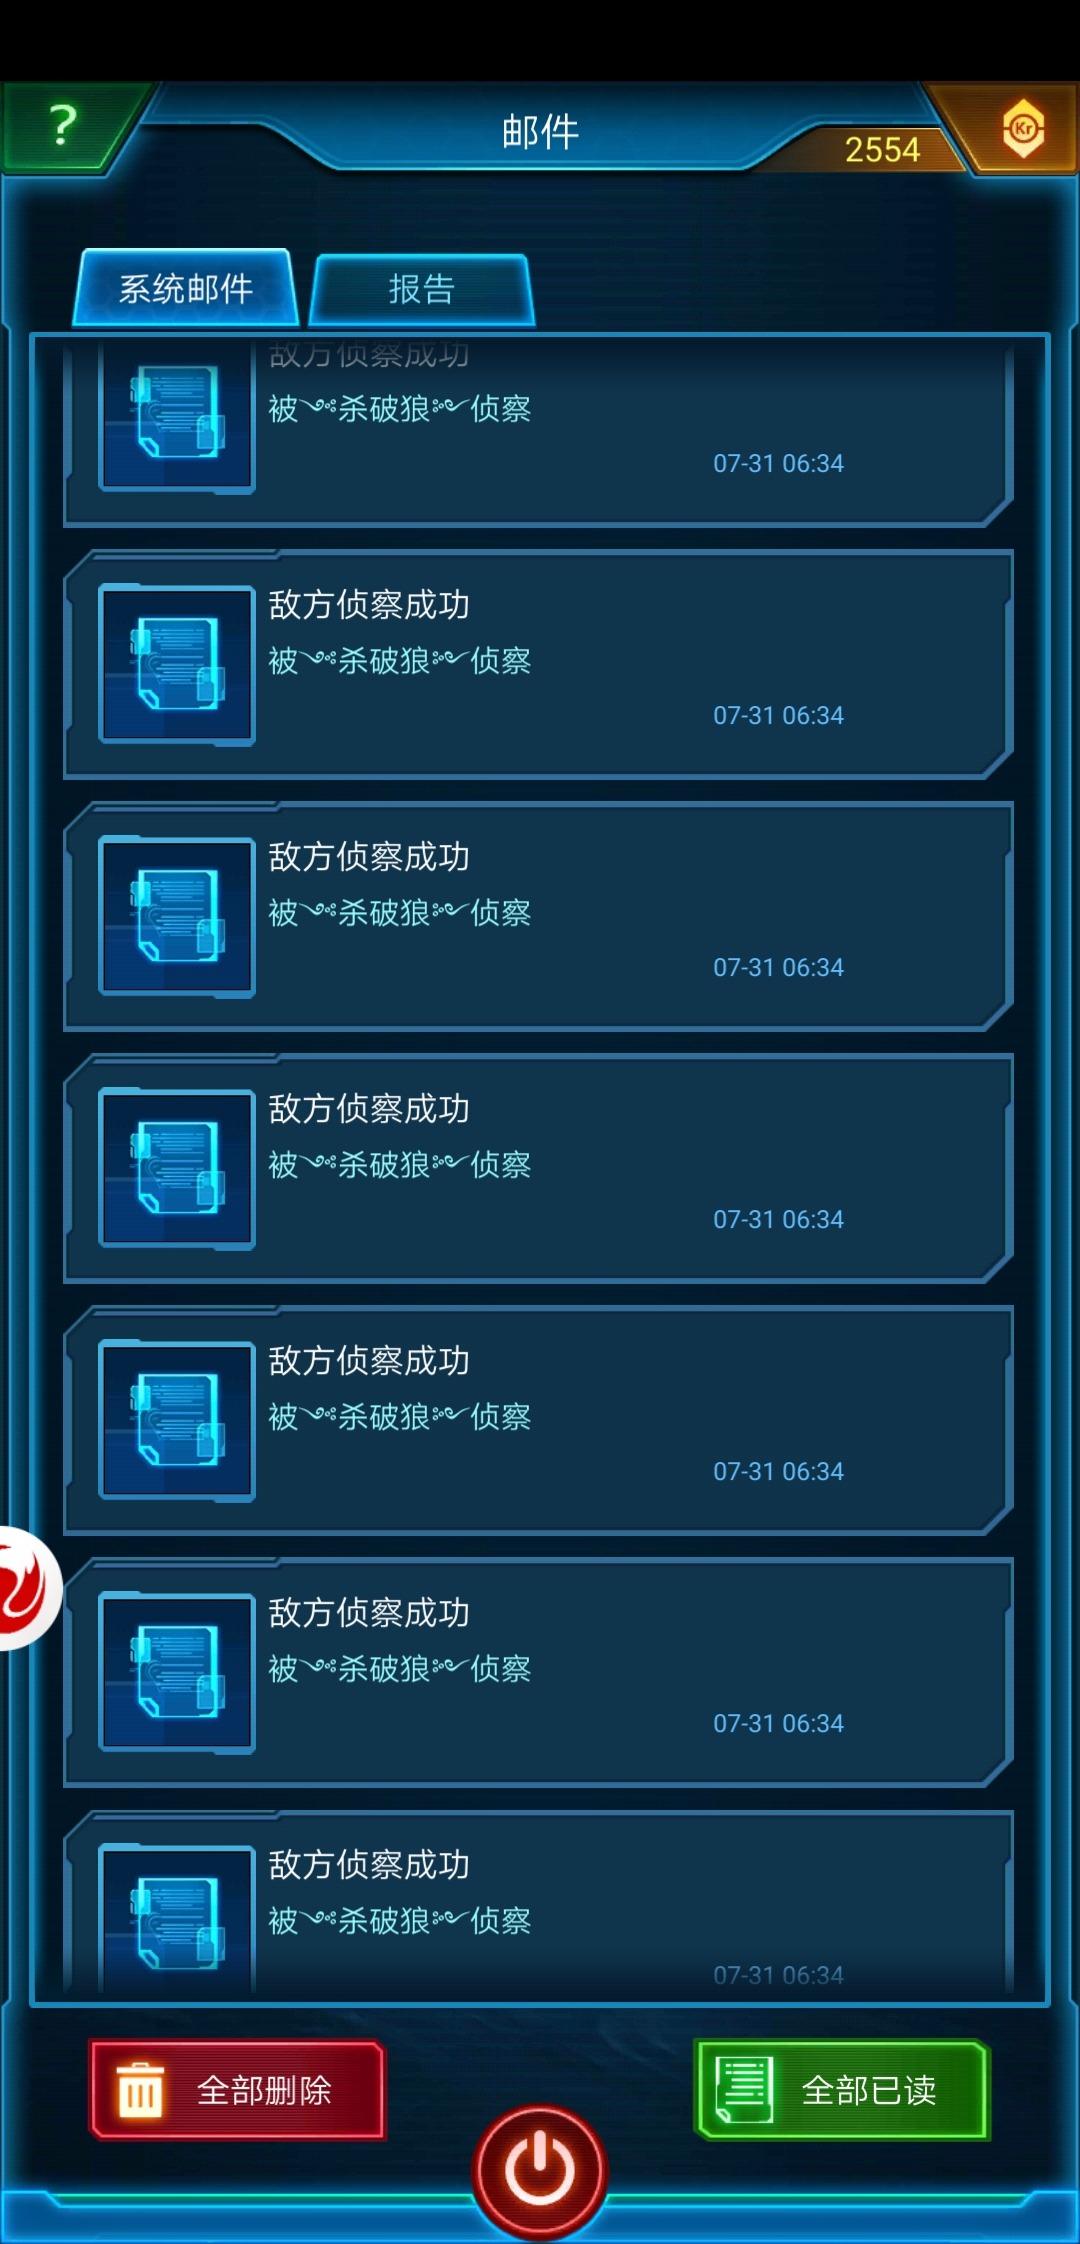 Screenshot_20190731_074755_com.jedigames.p16s.luobo.jpg